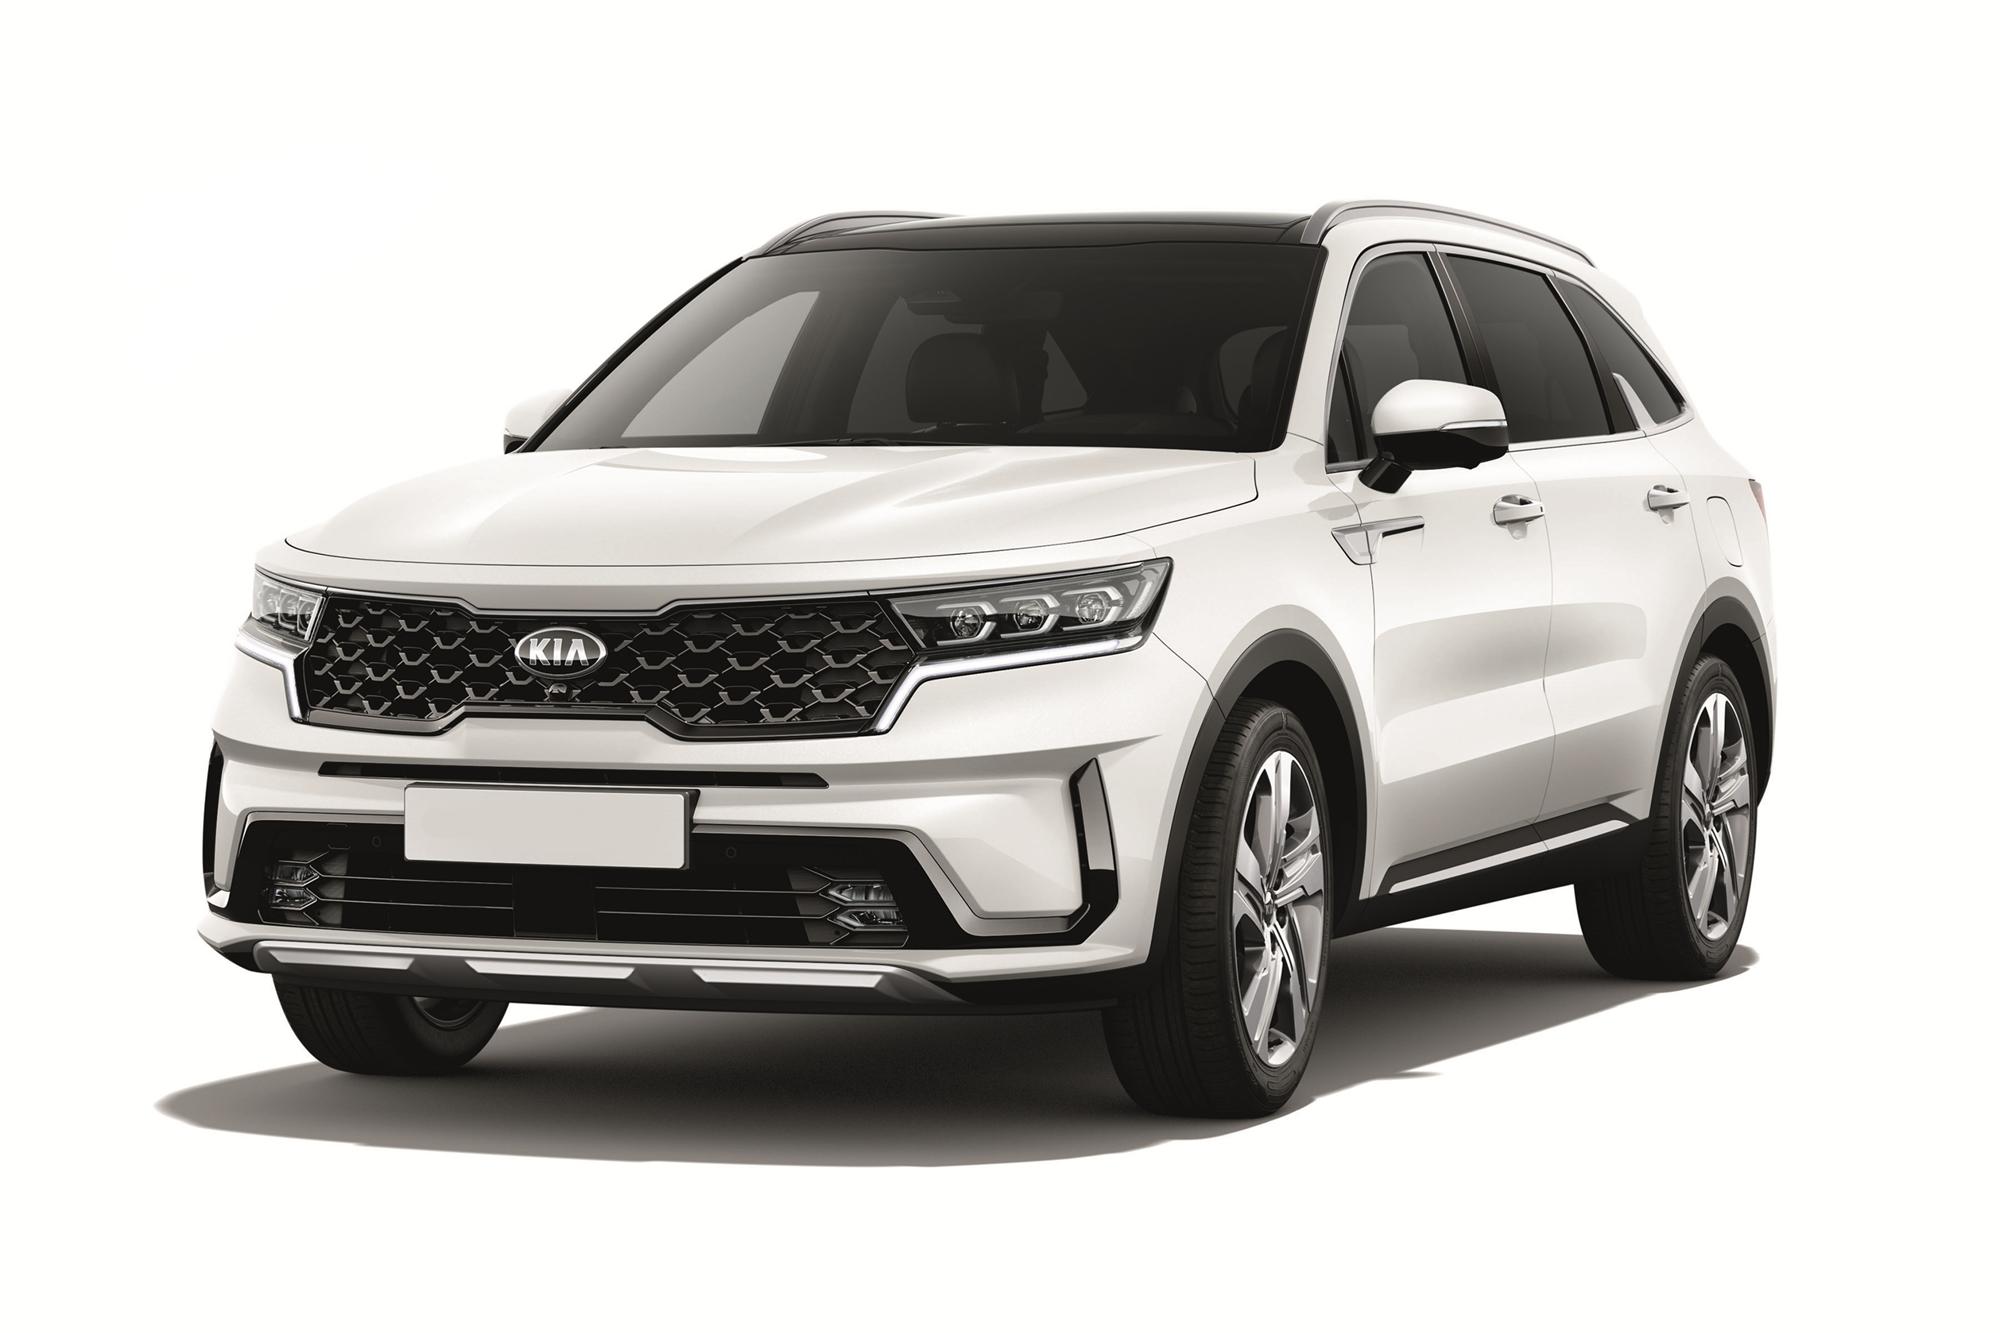 2021 kia sorento ex full specs features and price  carbuzz